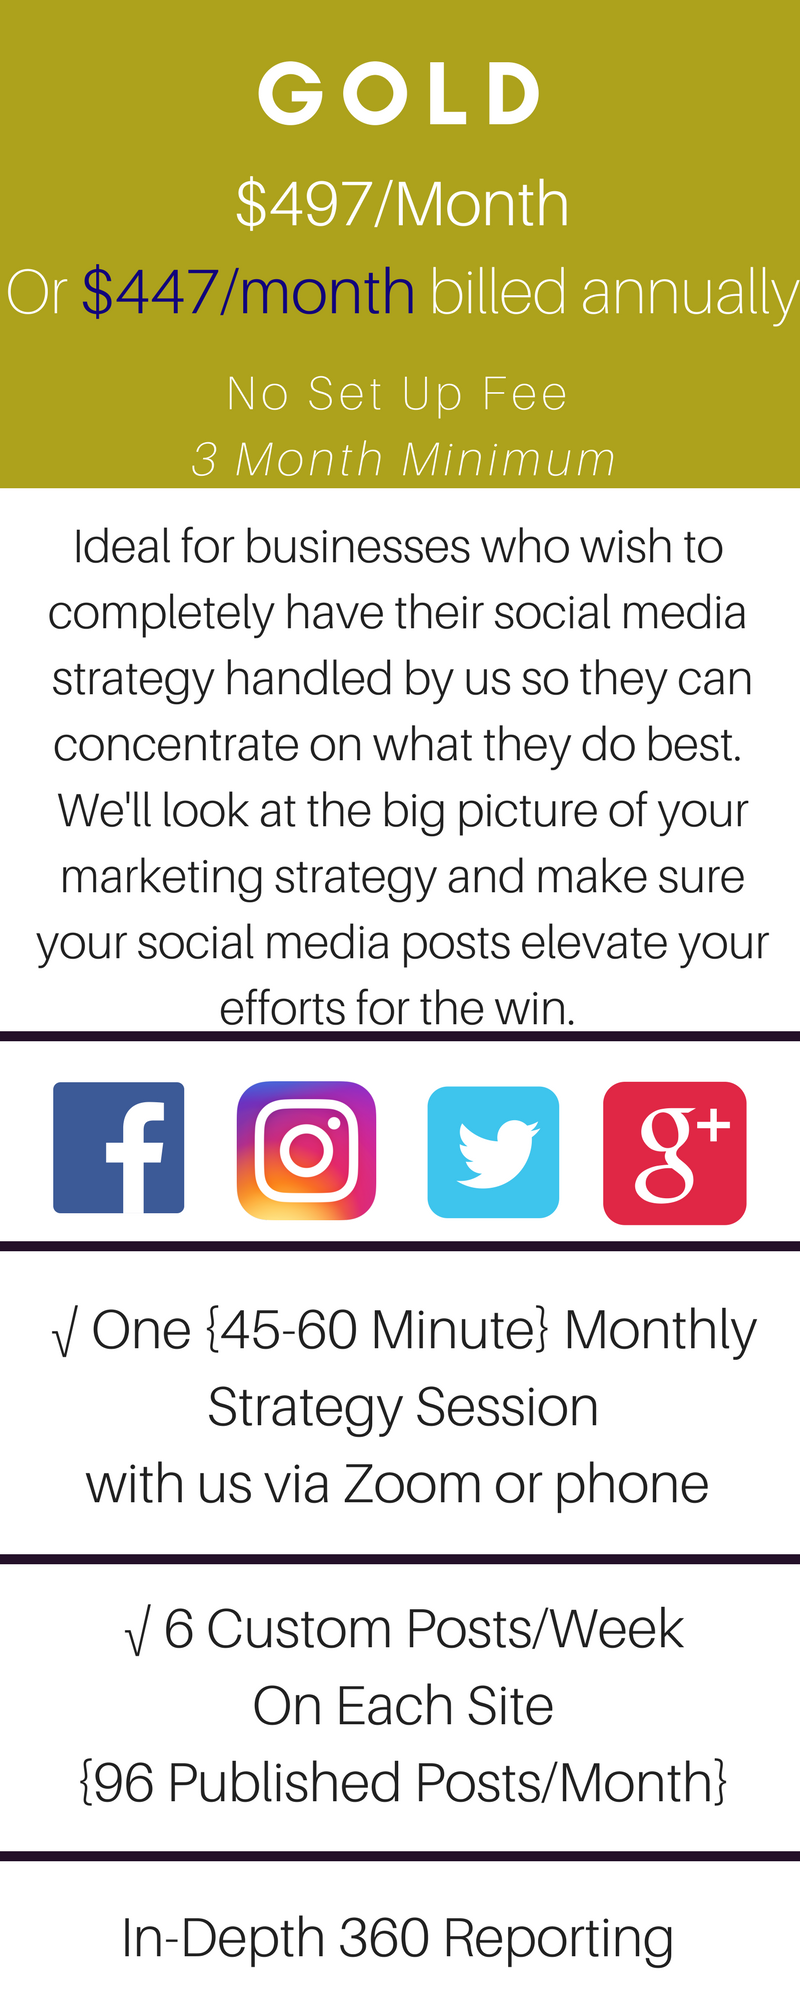 gold social media marketing package - perfectwavemarketing.com.png